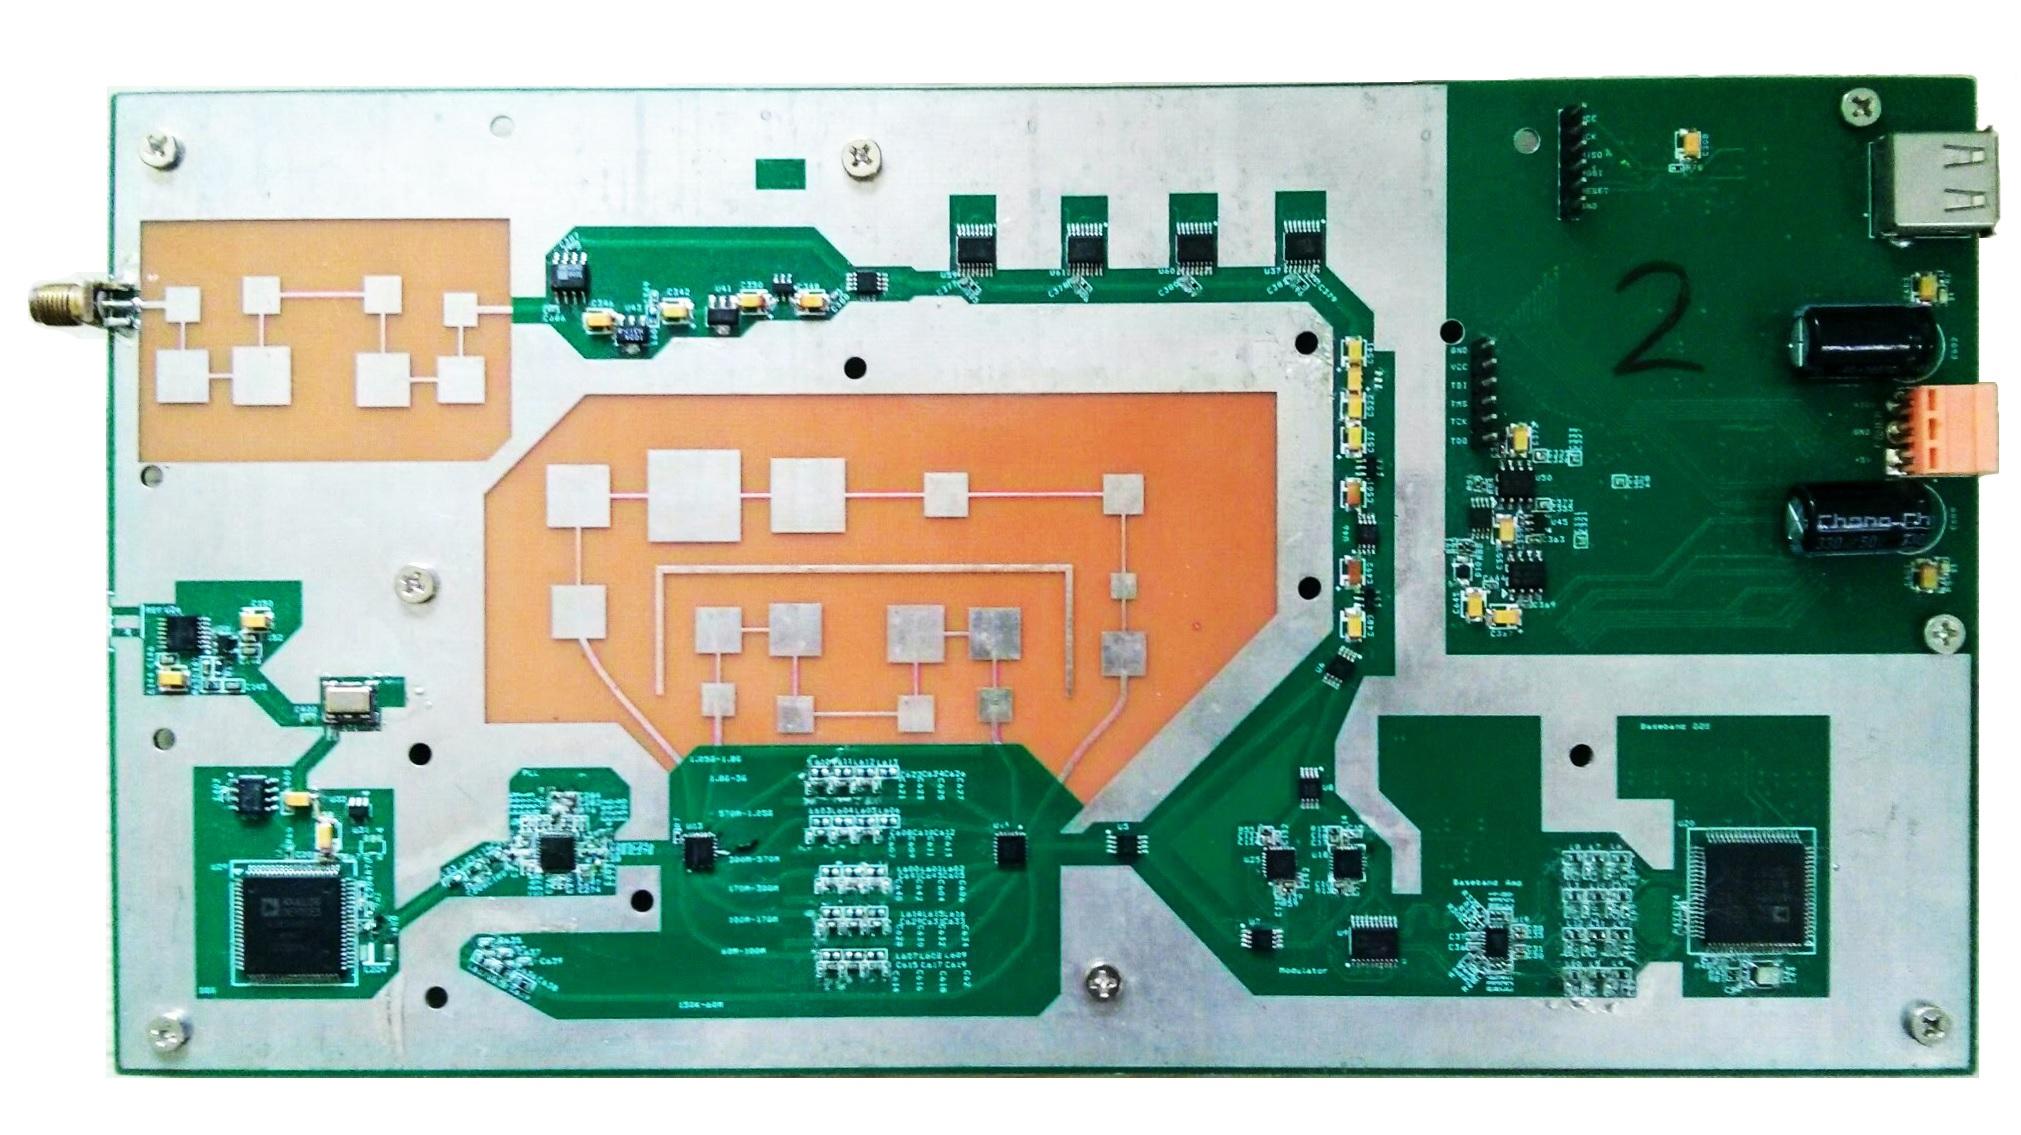 Fig. 2. Photo of the prototype